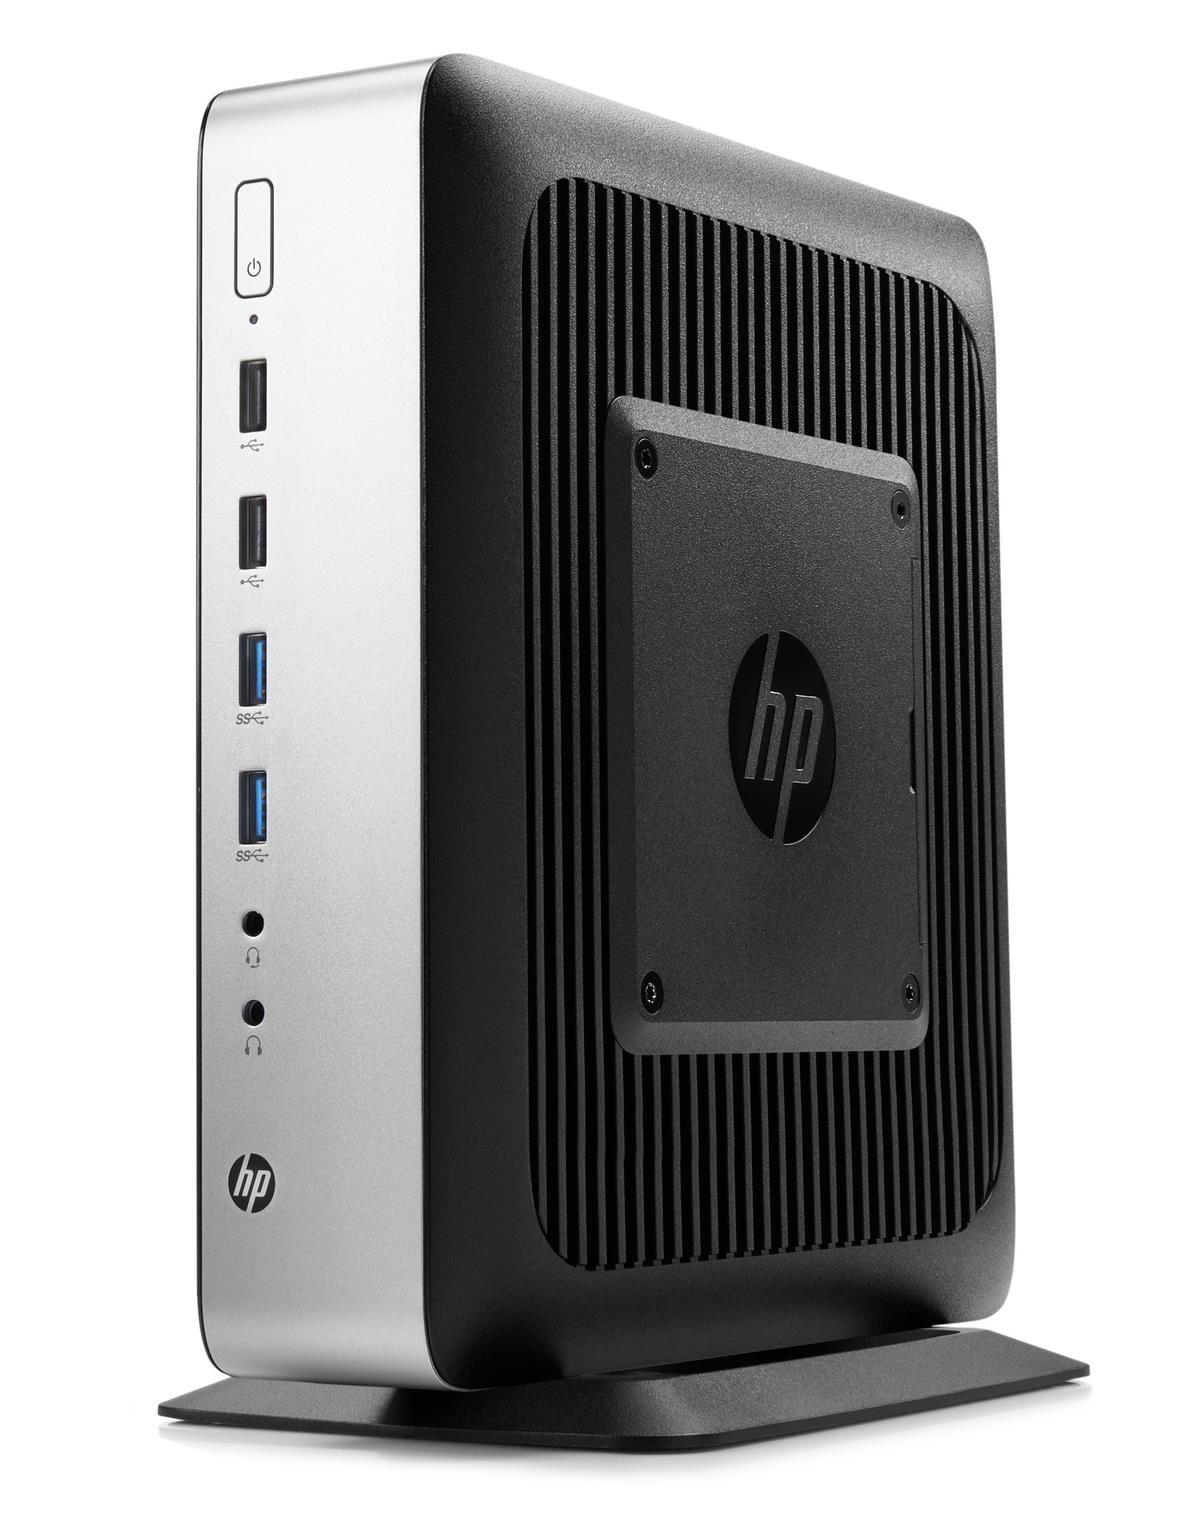 HP t730 Thin Client Quad Core (RX-427BB) 2.7GHz 8GB 32GB Flash LAN Windows 10 IoT Enterprise (Radeon HD 9000)